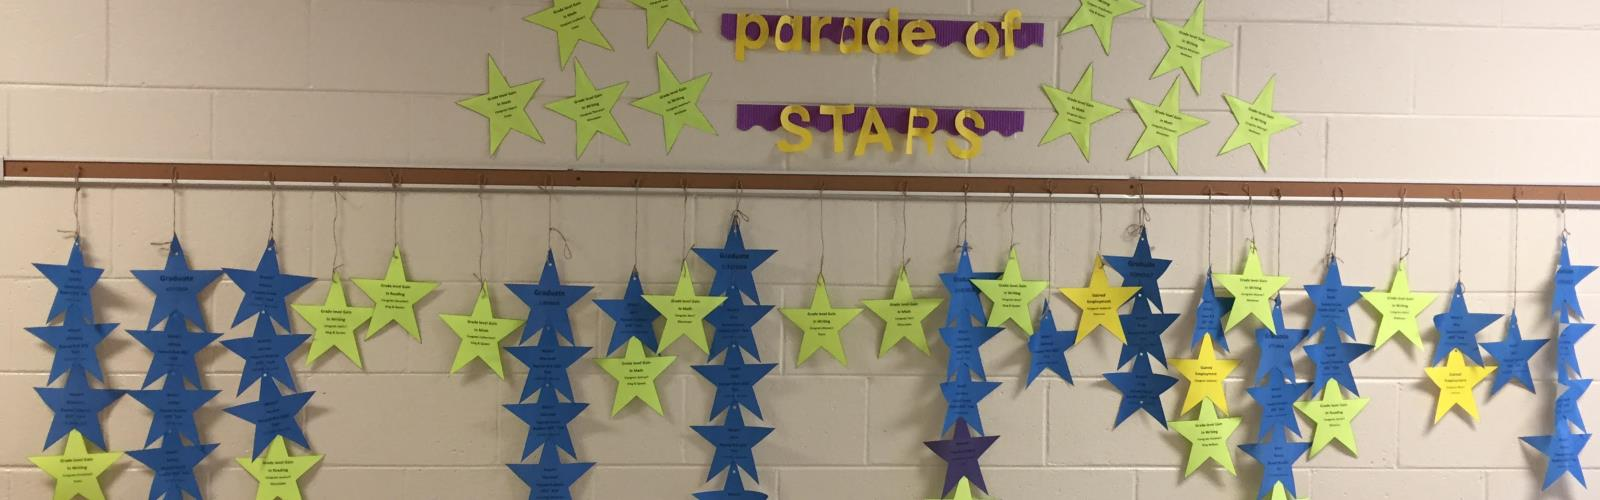 parade of stars